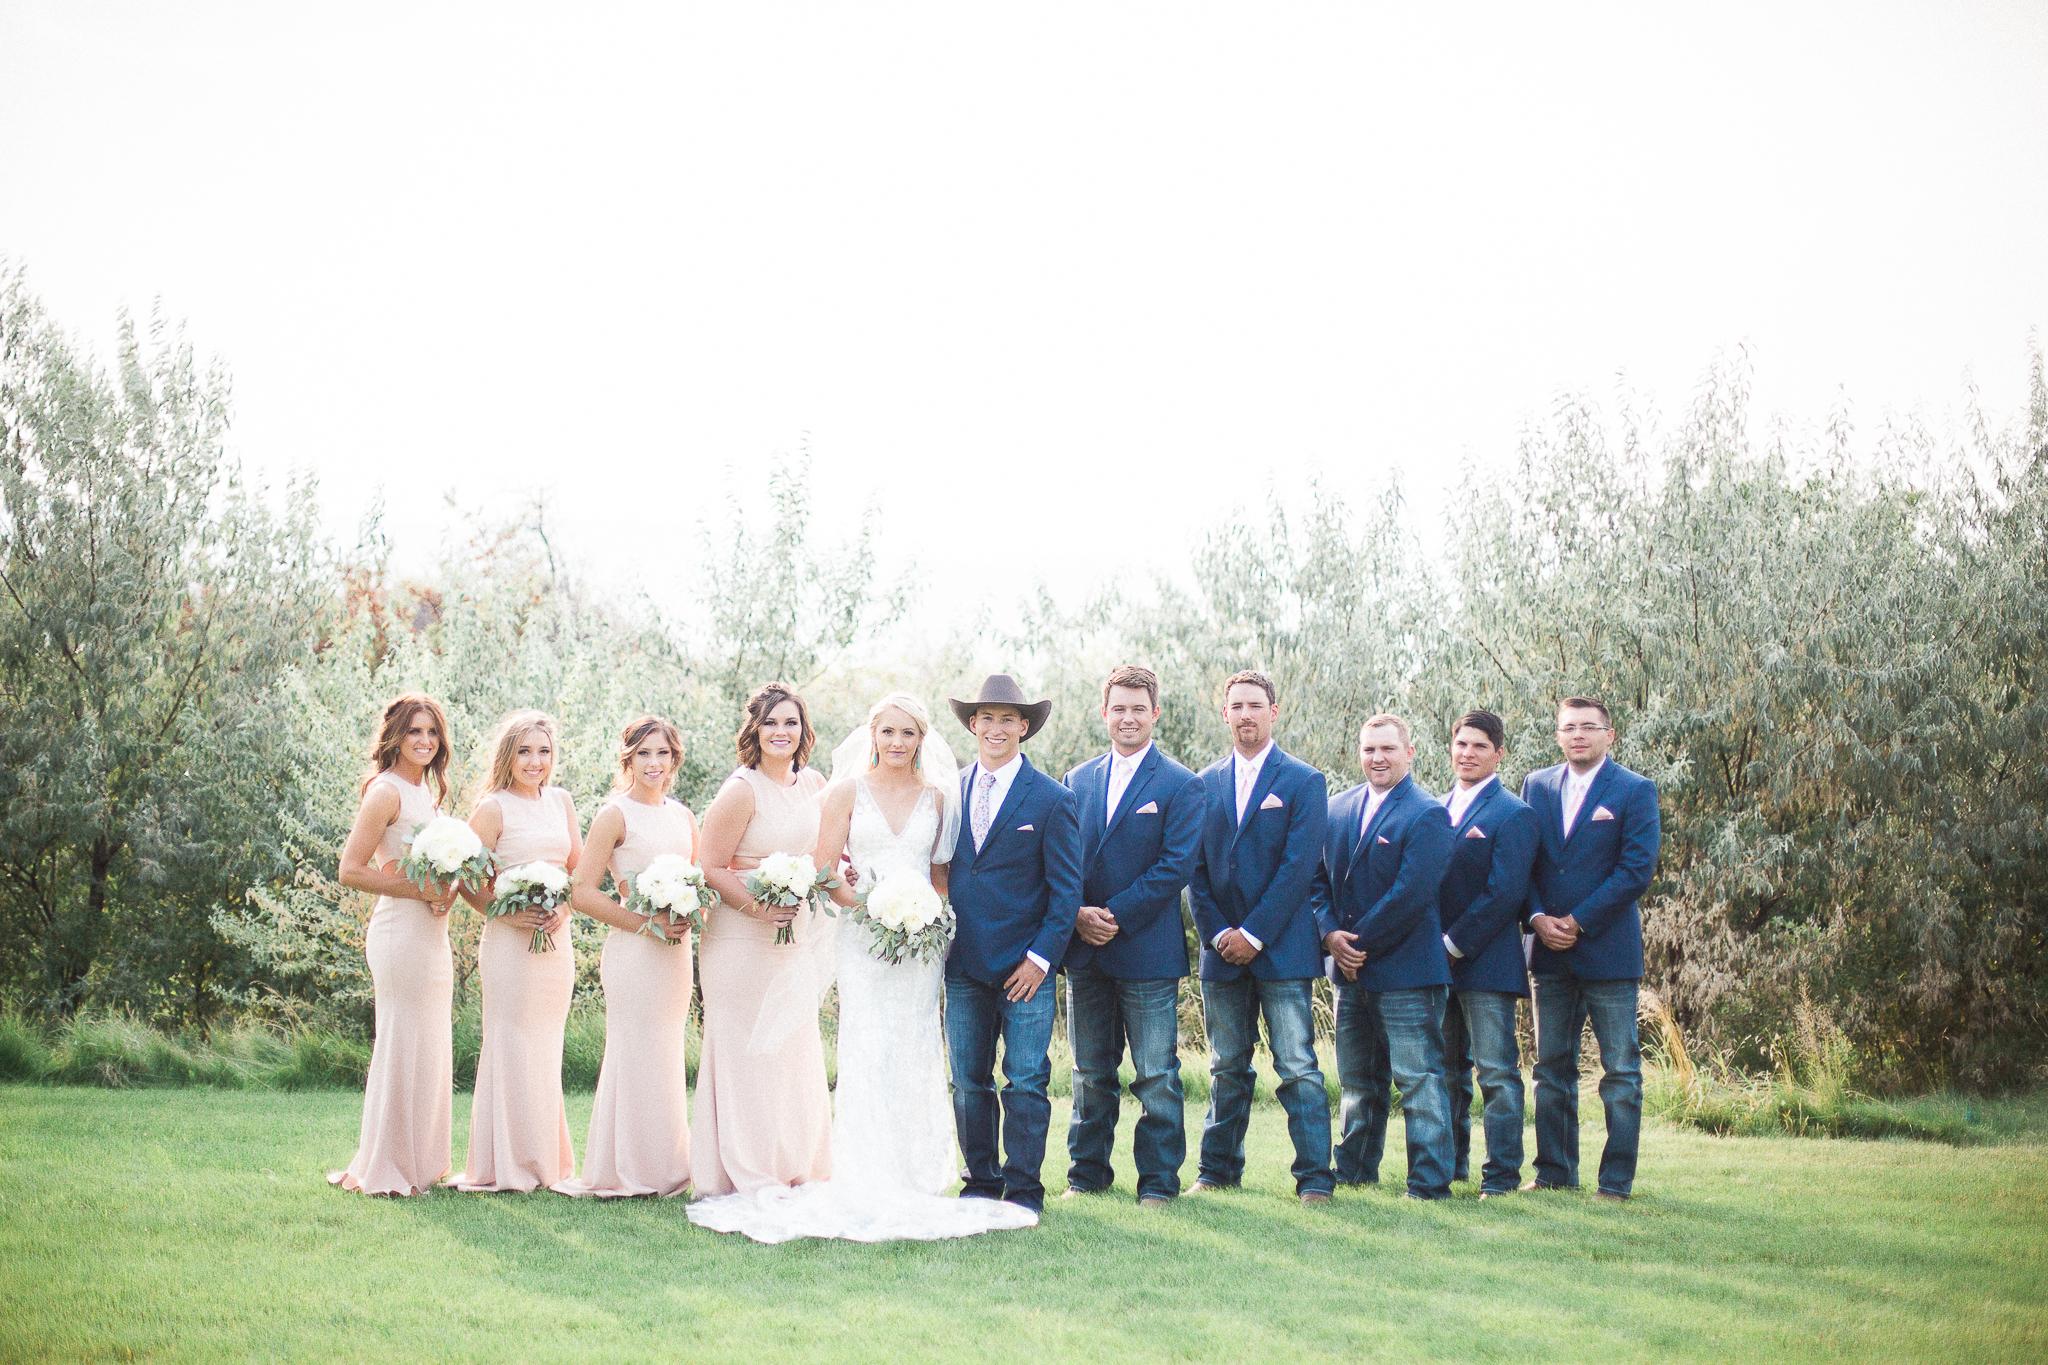 Laramie-Erik-Montana-Wedding-Highlight-BLOG-87